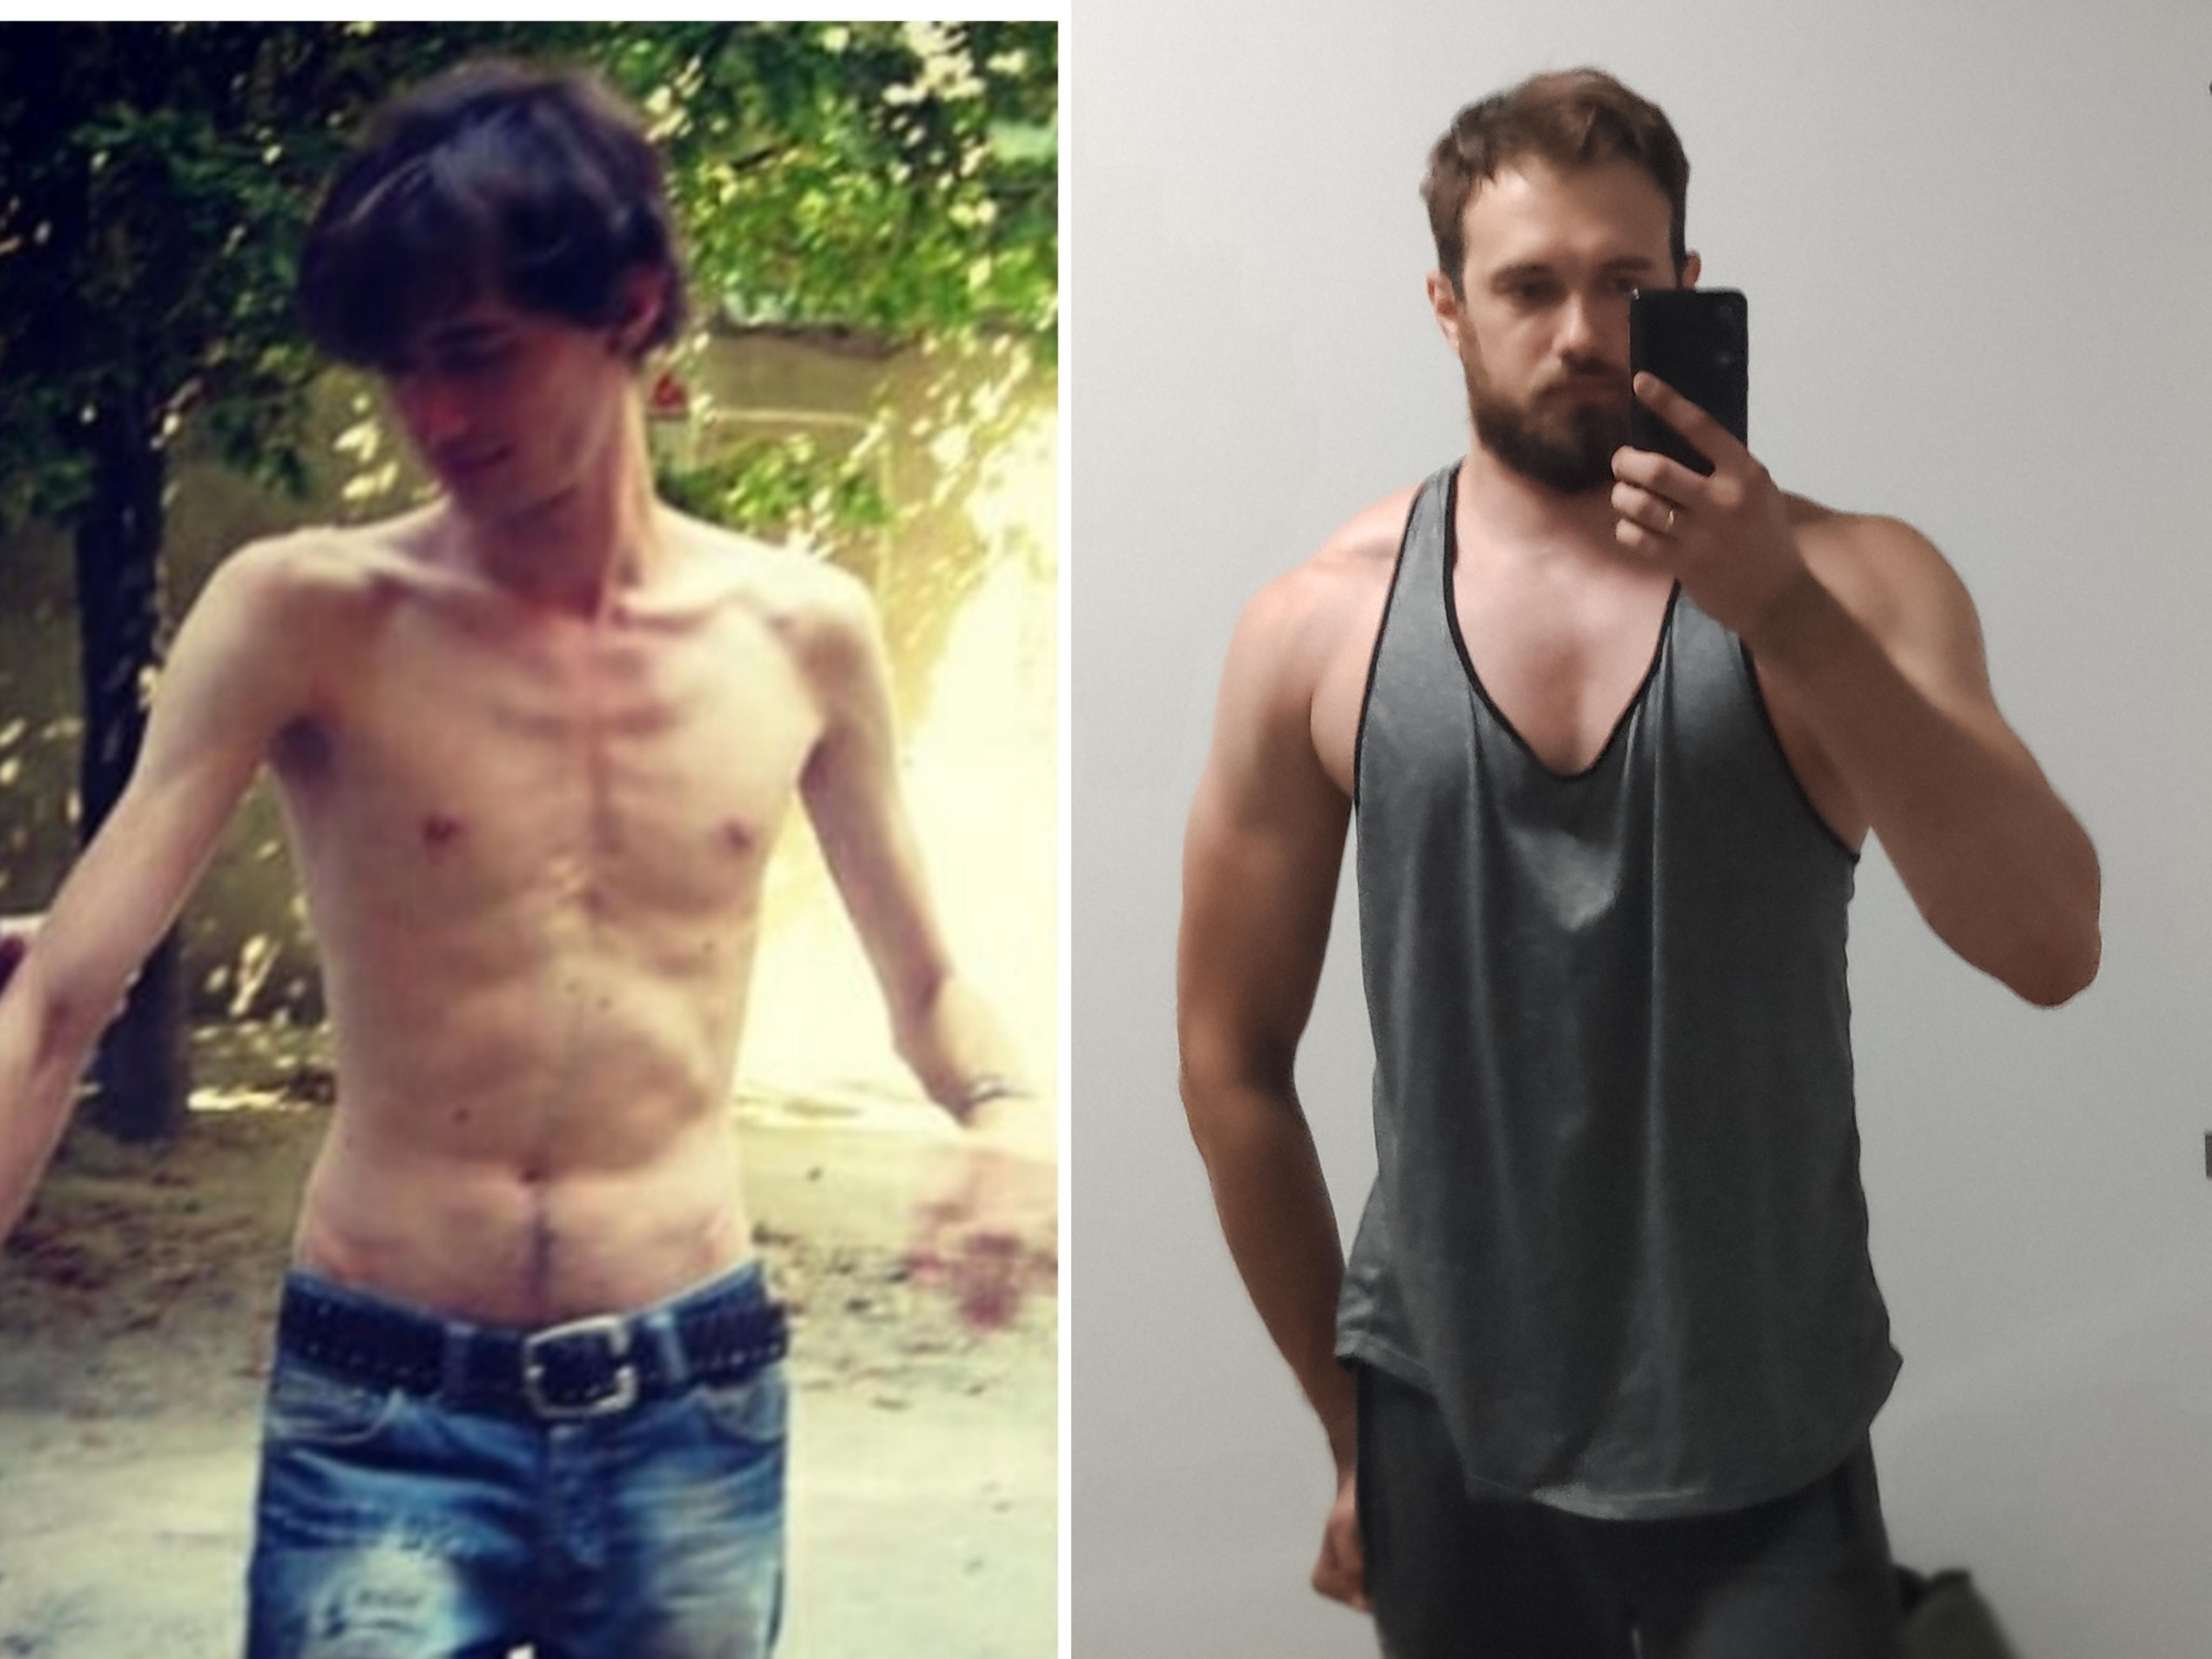 6 feet 3 Male Progress Pics of 65 lbs Muscle Gain 125 lbs to 190 lbs